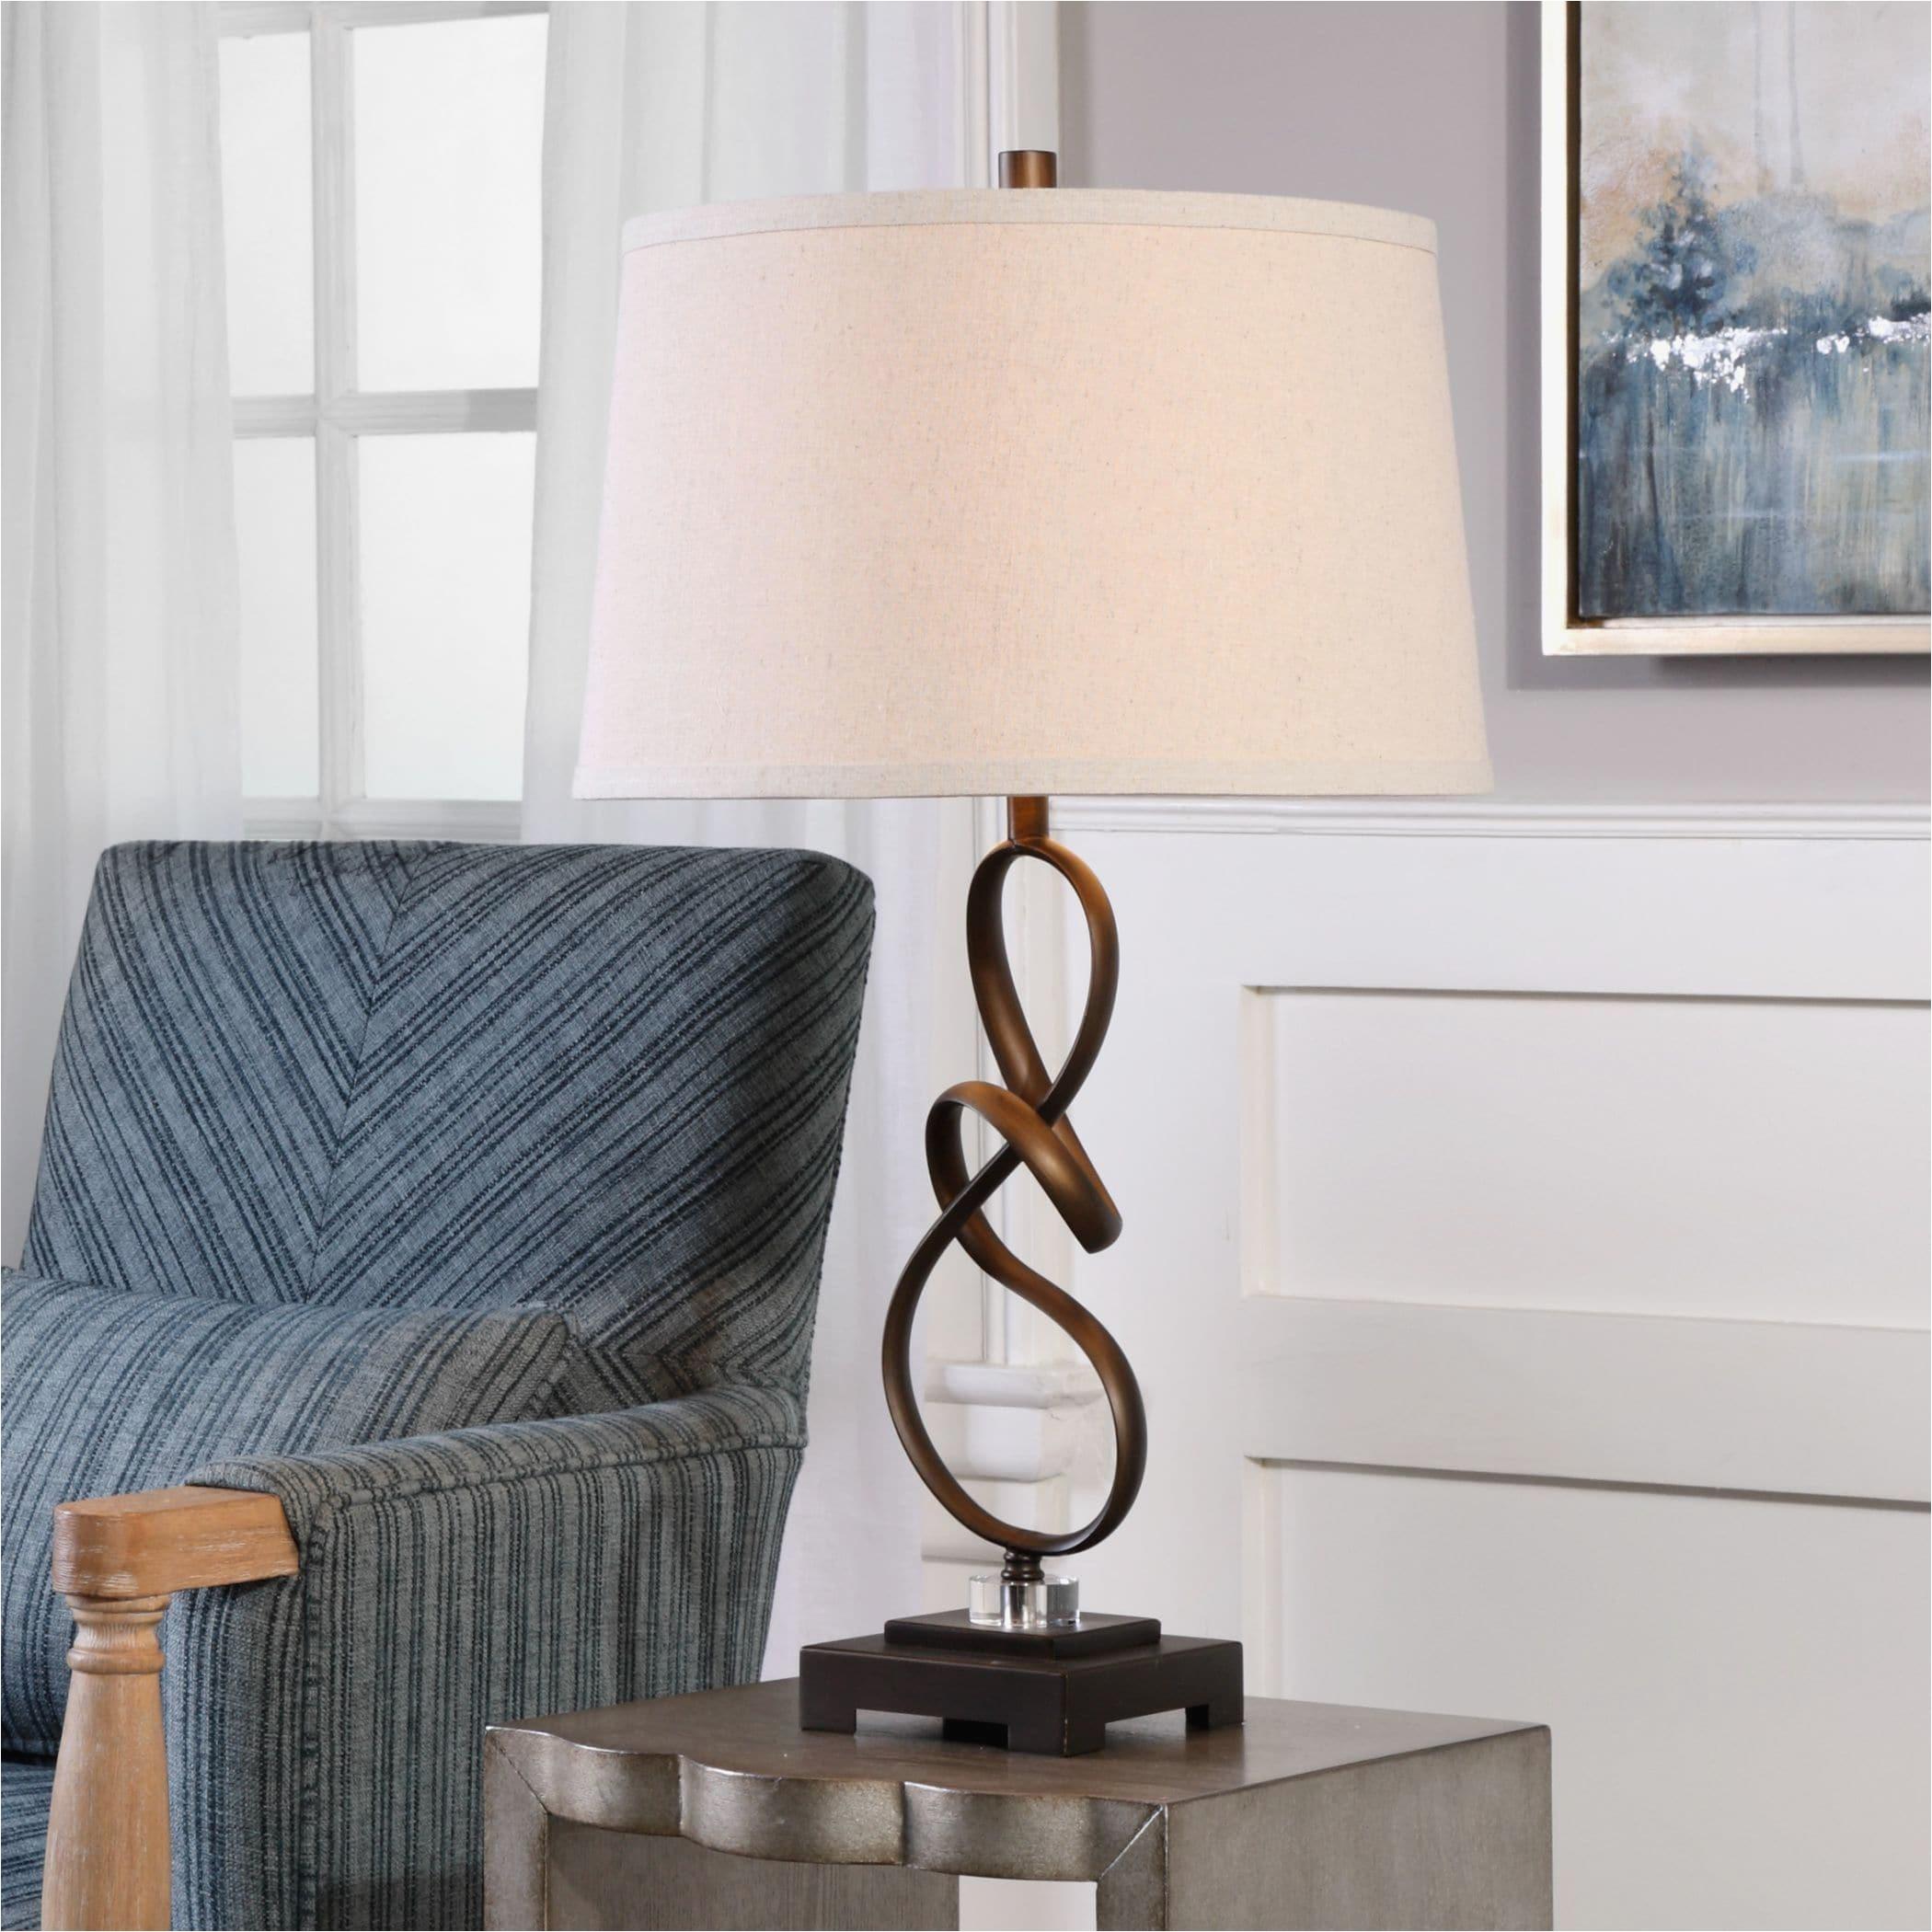 bedroom lamp shades extraordinary bedroom lamp shades on gorgeous bedroom lamp shades within funeral home